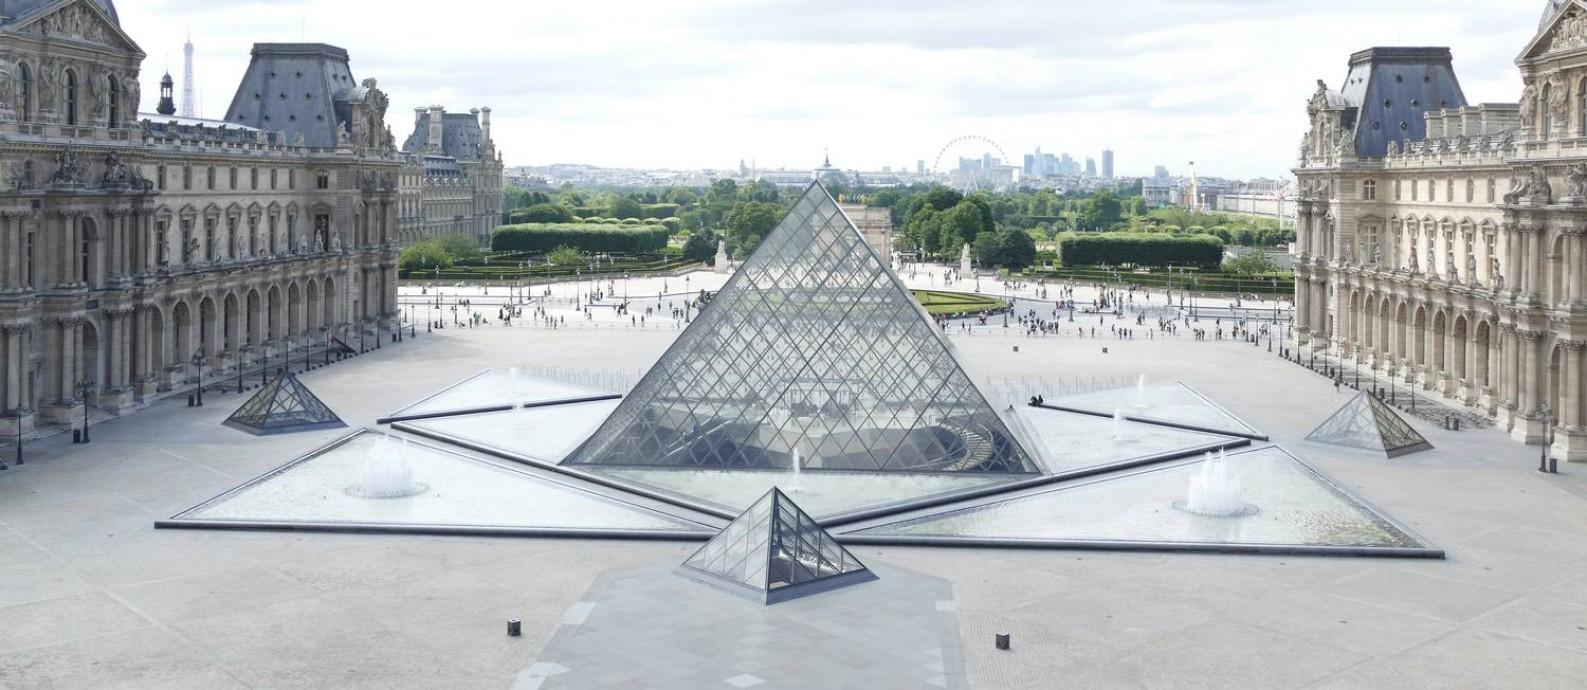 Museu do Louvre Foto: Fernando Eichenberg